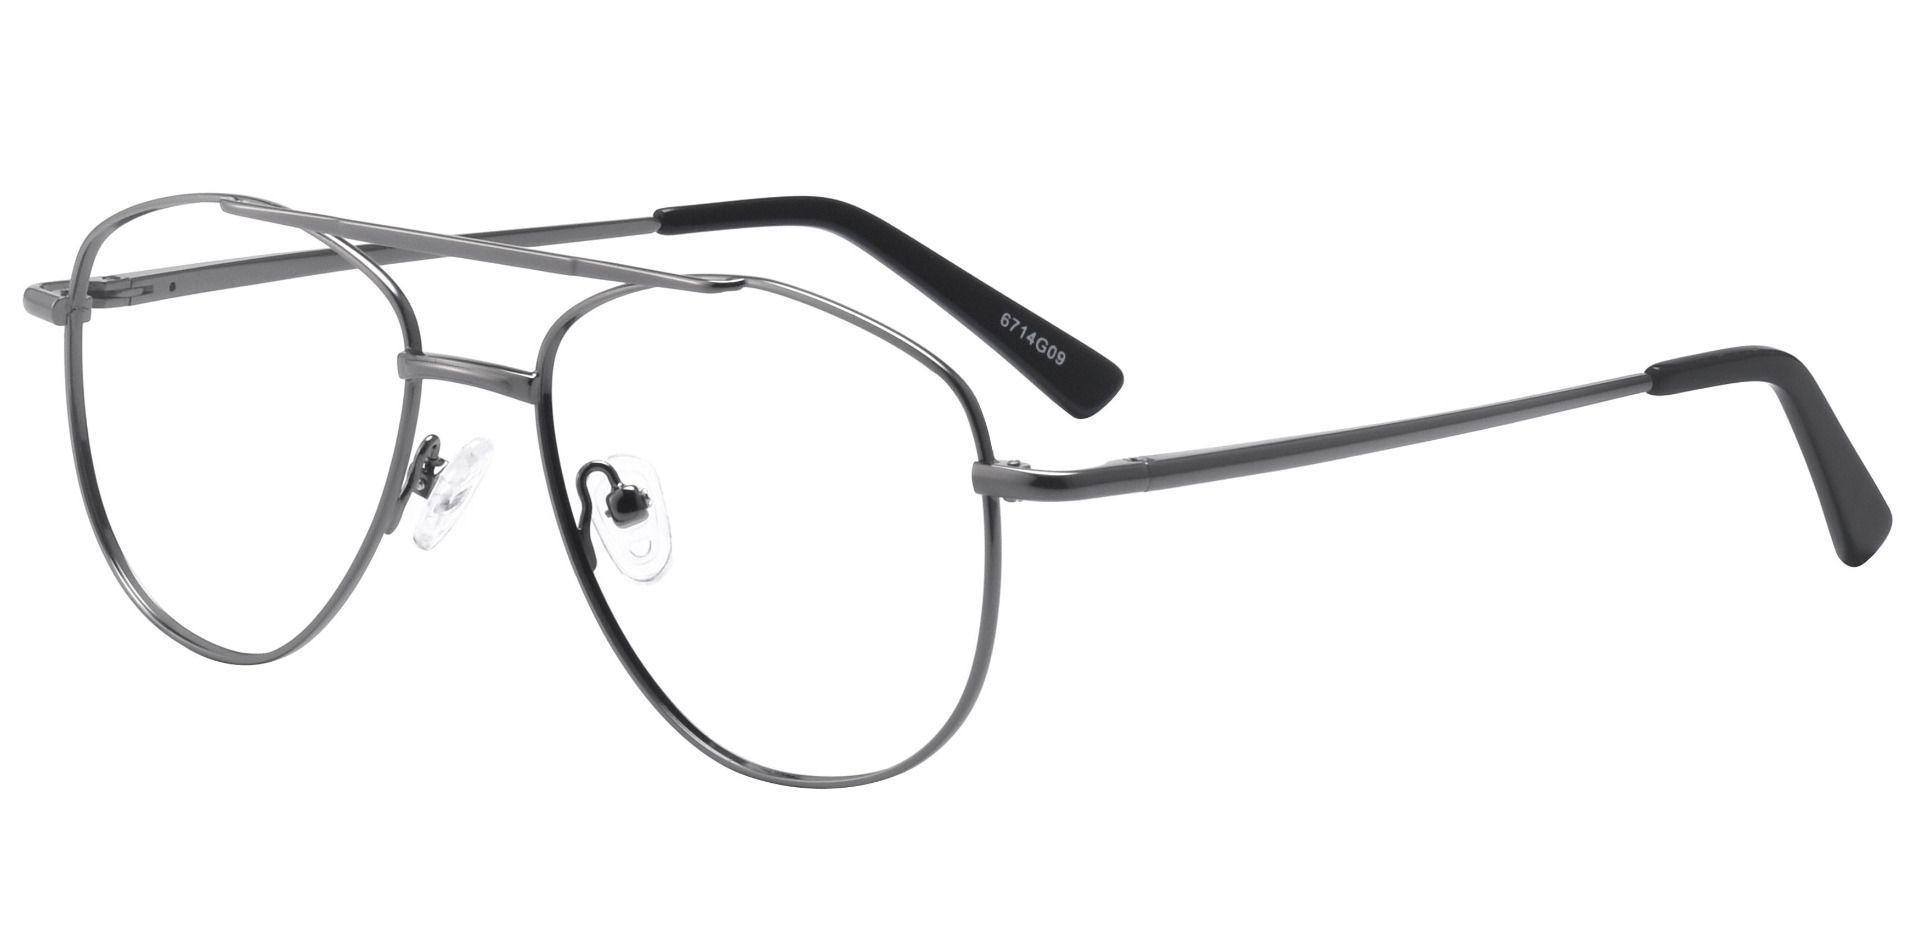 Dwight Aviator Single Vision Glasses - Gray